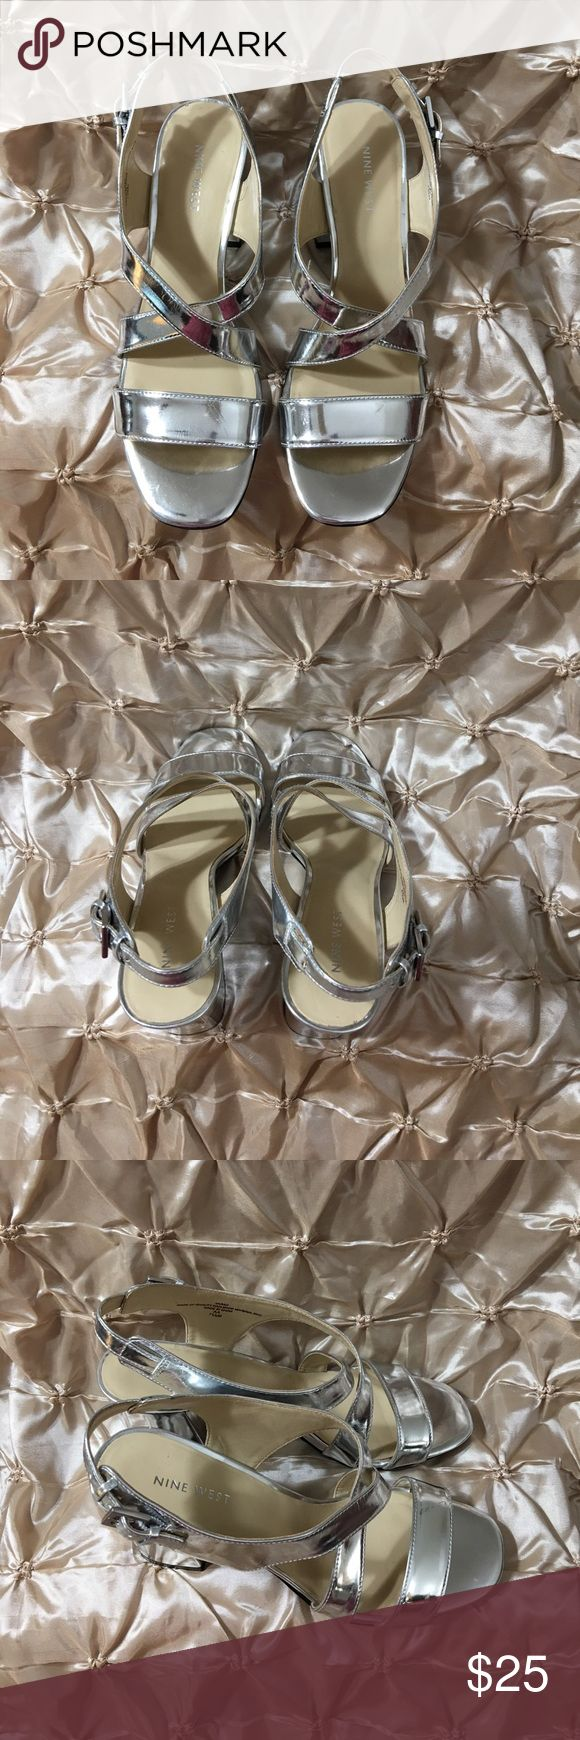 "Nine West Silver Sandals Size 7 1/2 Women Nine West Silver Sandals Size 7 1/2 Women have scratches through out the sandals. Heel Height 3 1/2"" Nine West Shoes Sandals"